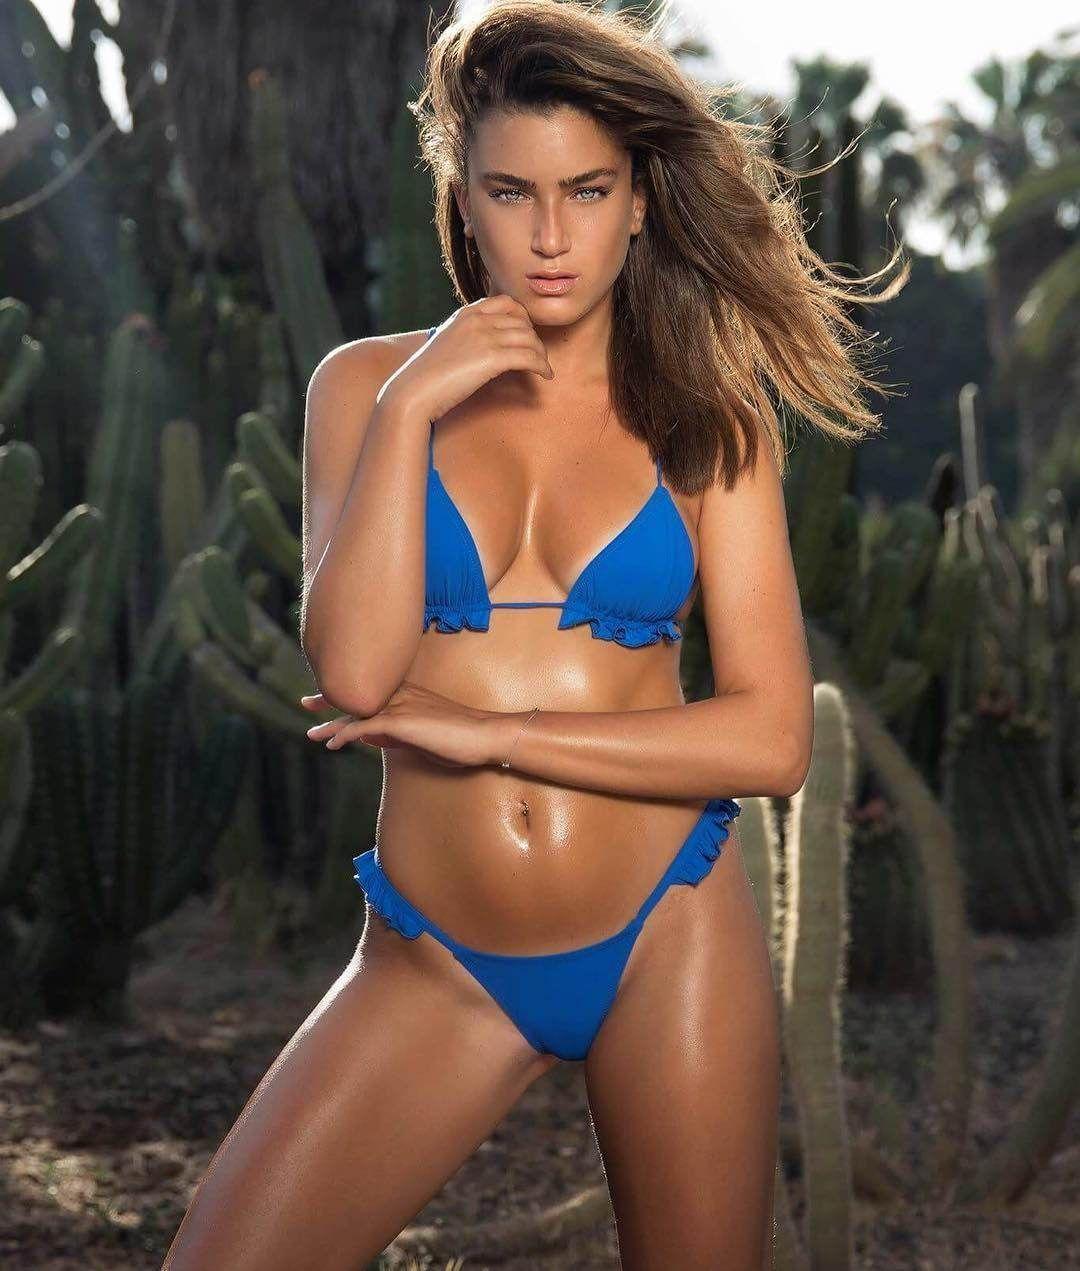 Busty raya miller of naked news gif huge boobs adult-7846